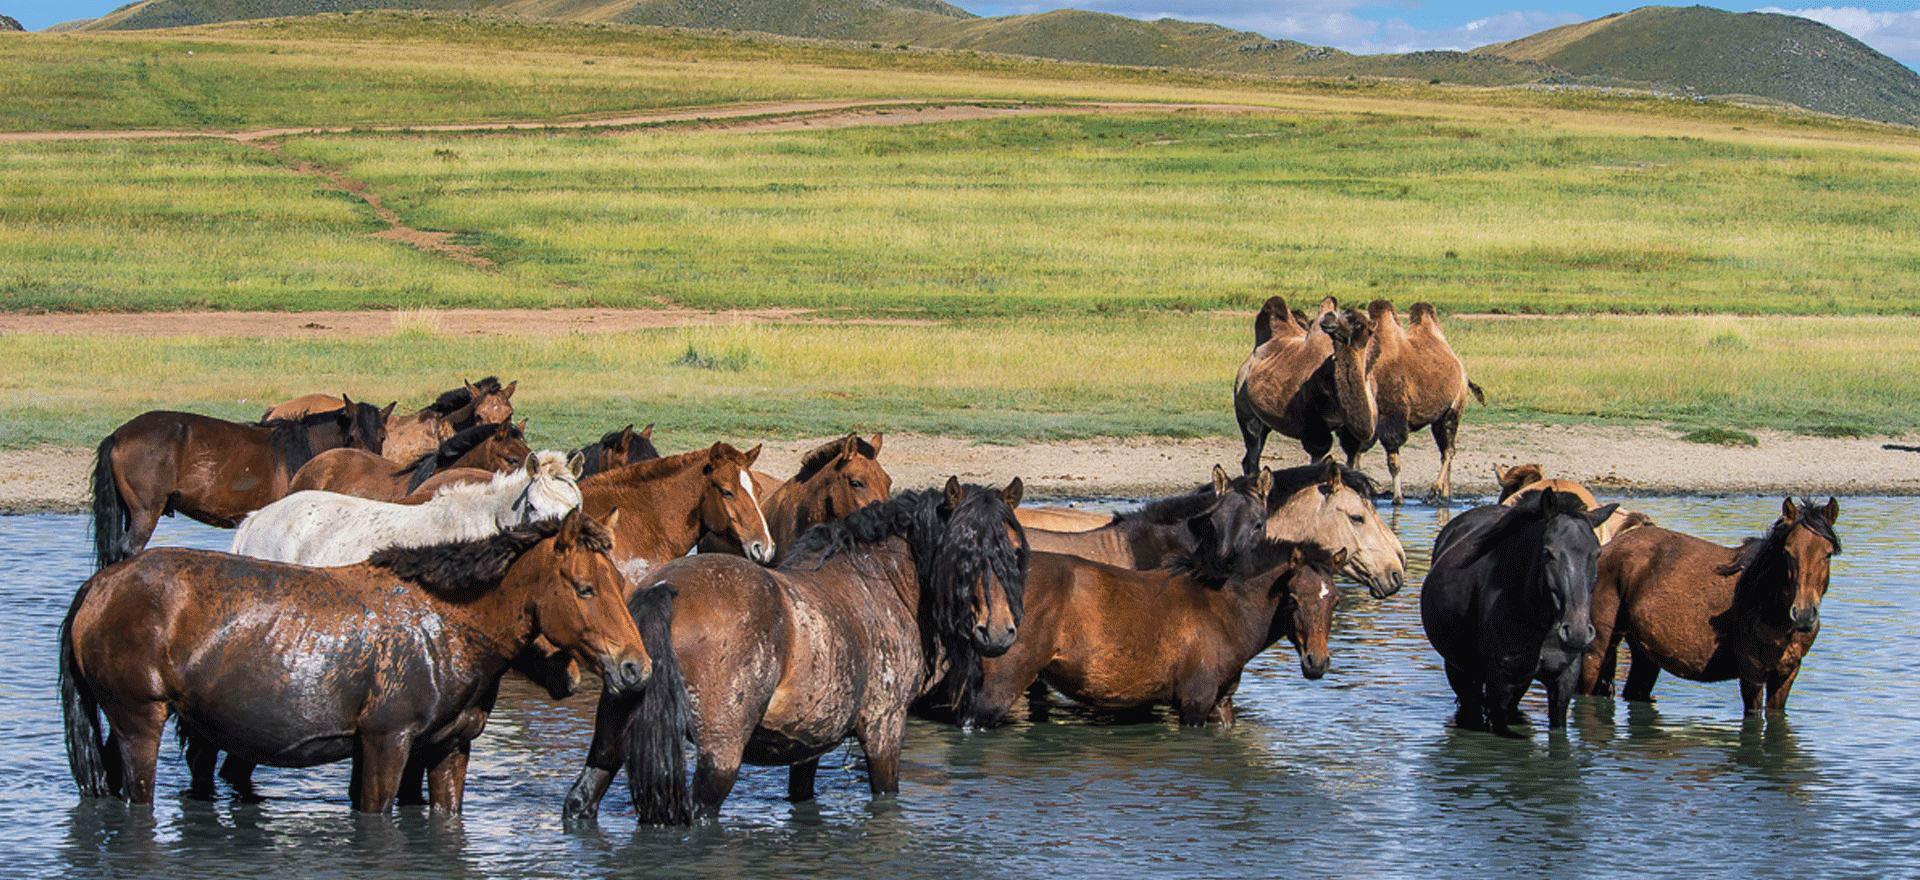 Horses in Mongolia - Mongolia itinerary